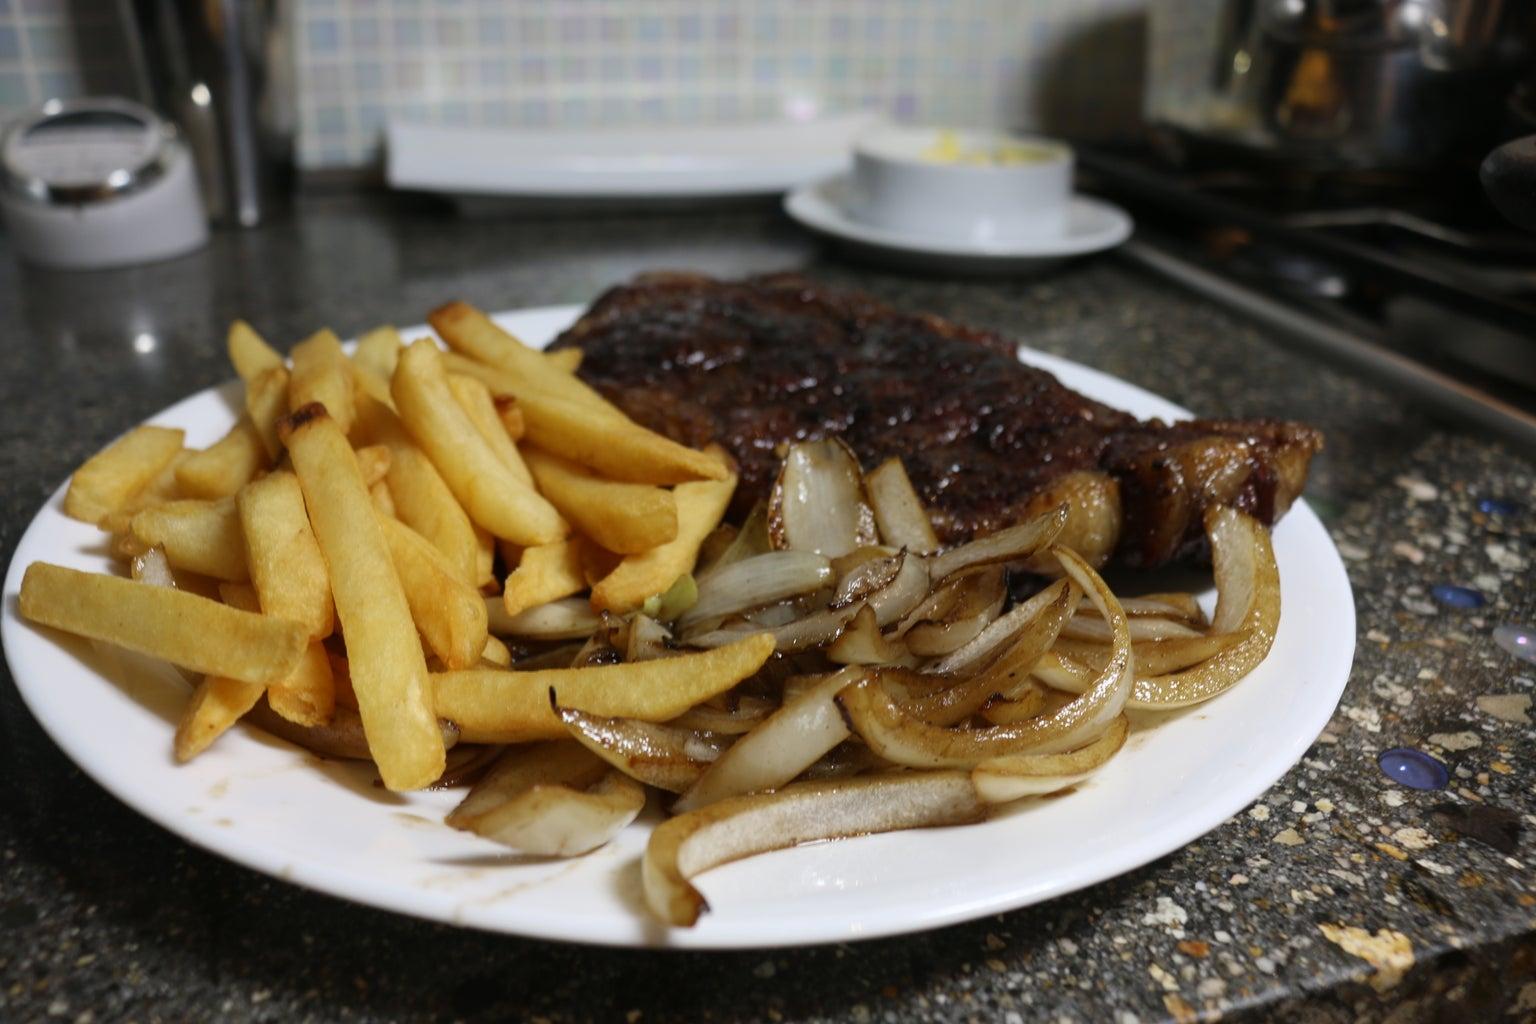 Searing the Steak